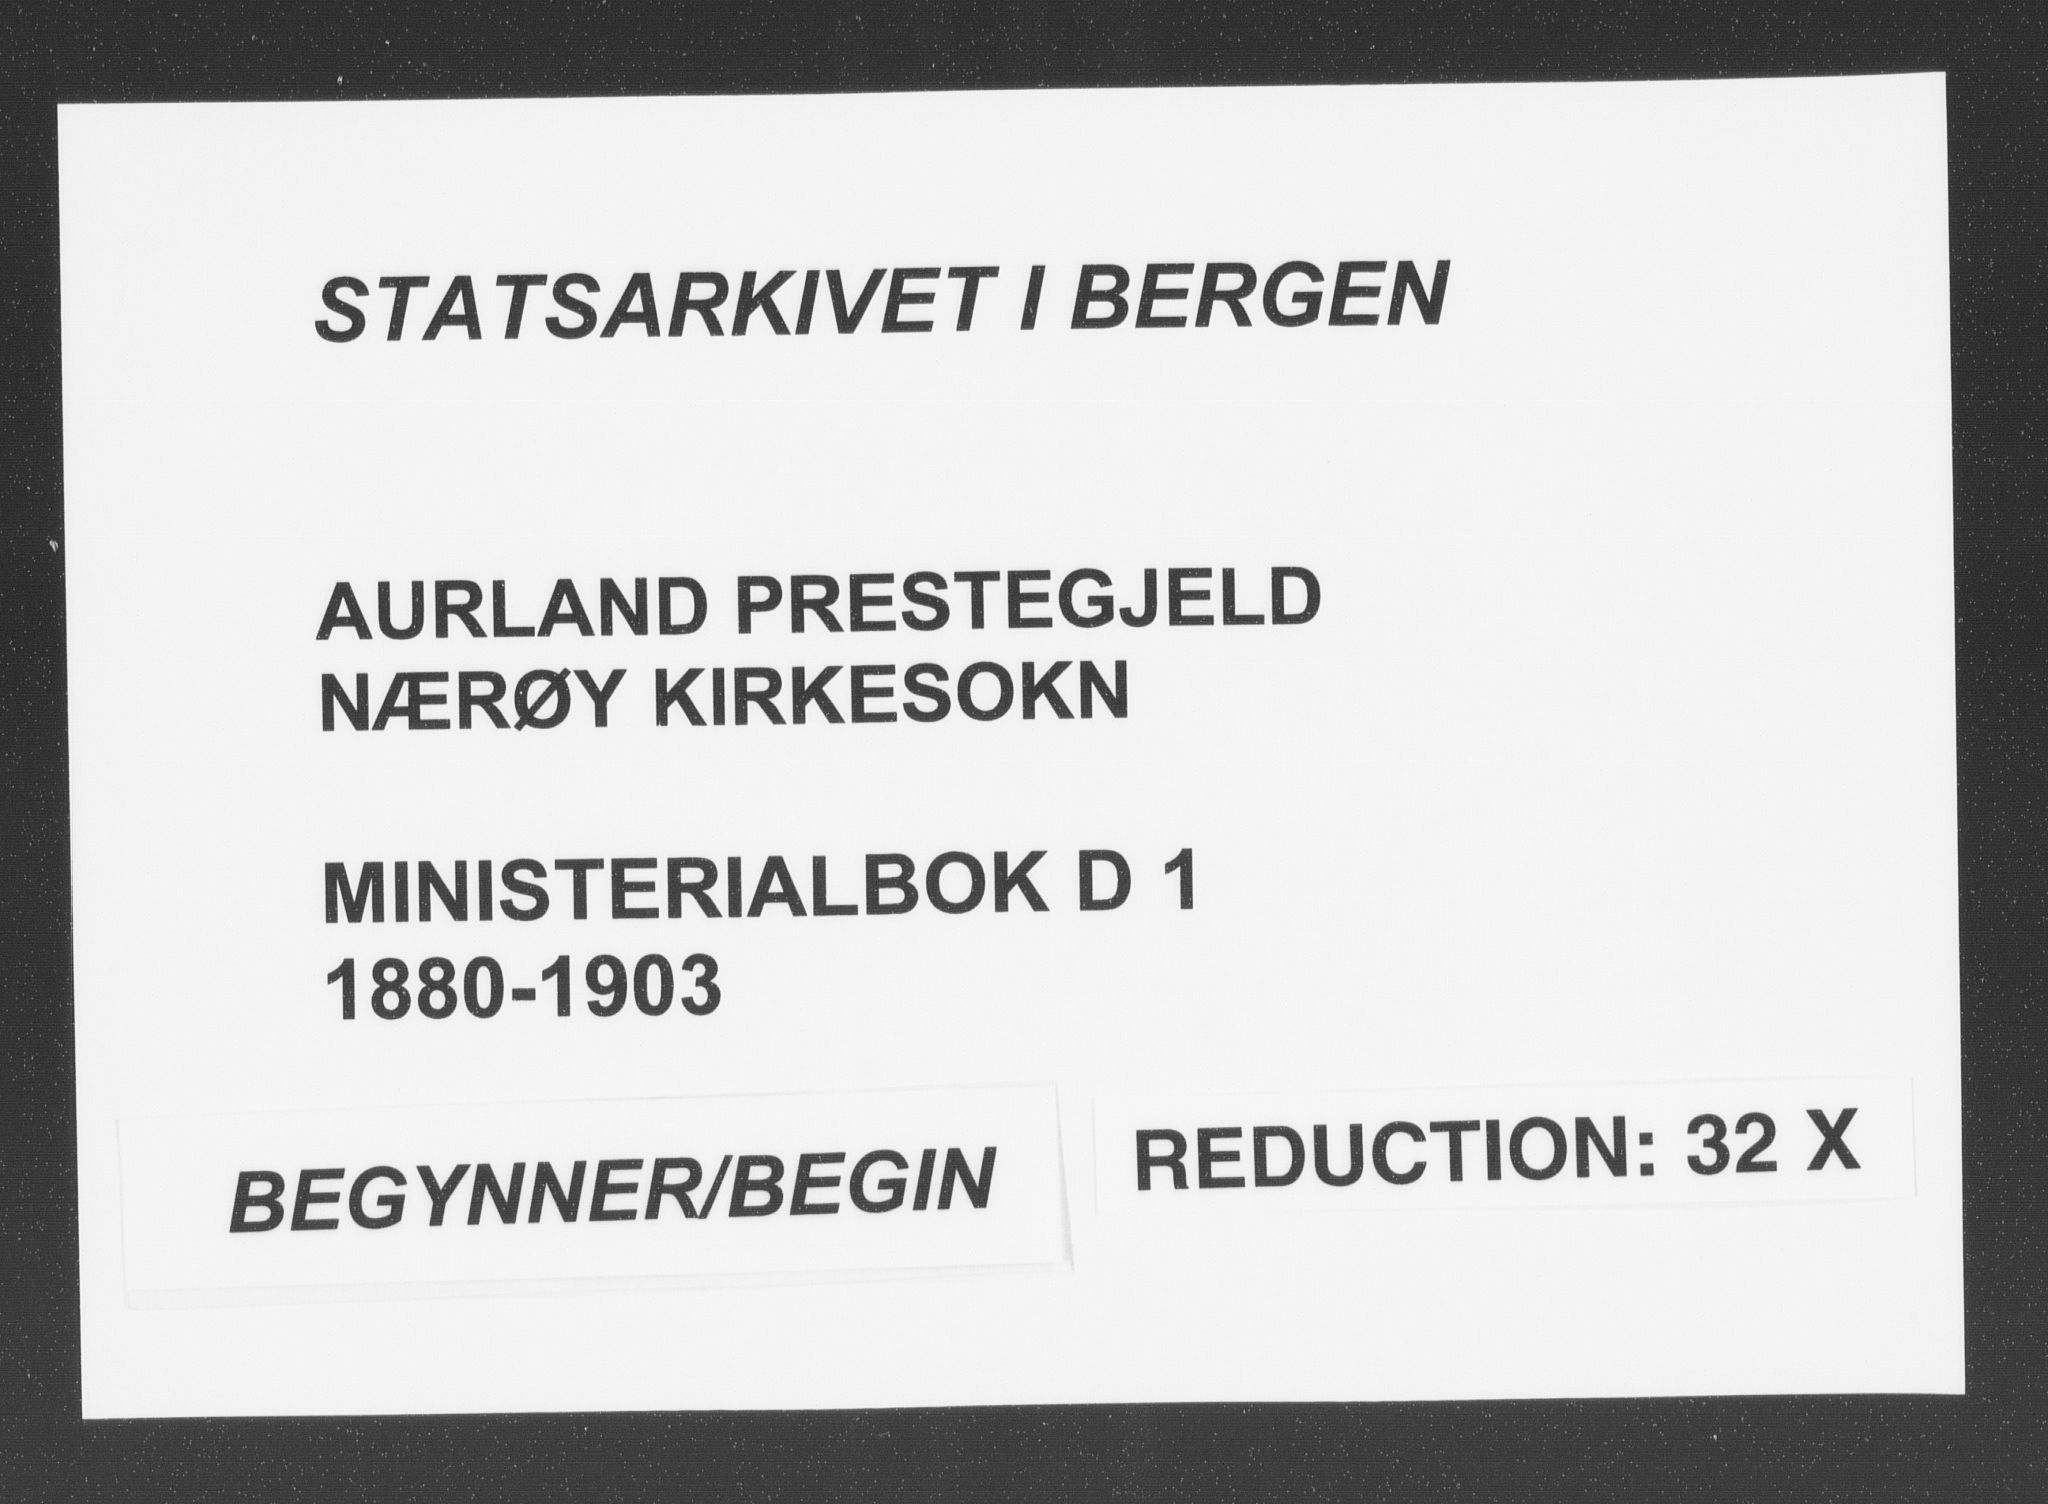 SAB, Aurland sokneprestembete, H/Ha/Had/L0001: Ministerialbok nr. D  1, 1880-1903